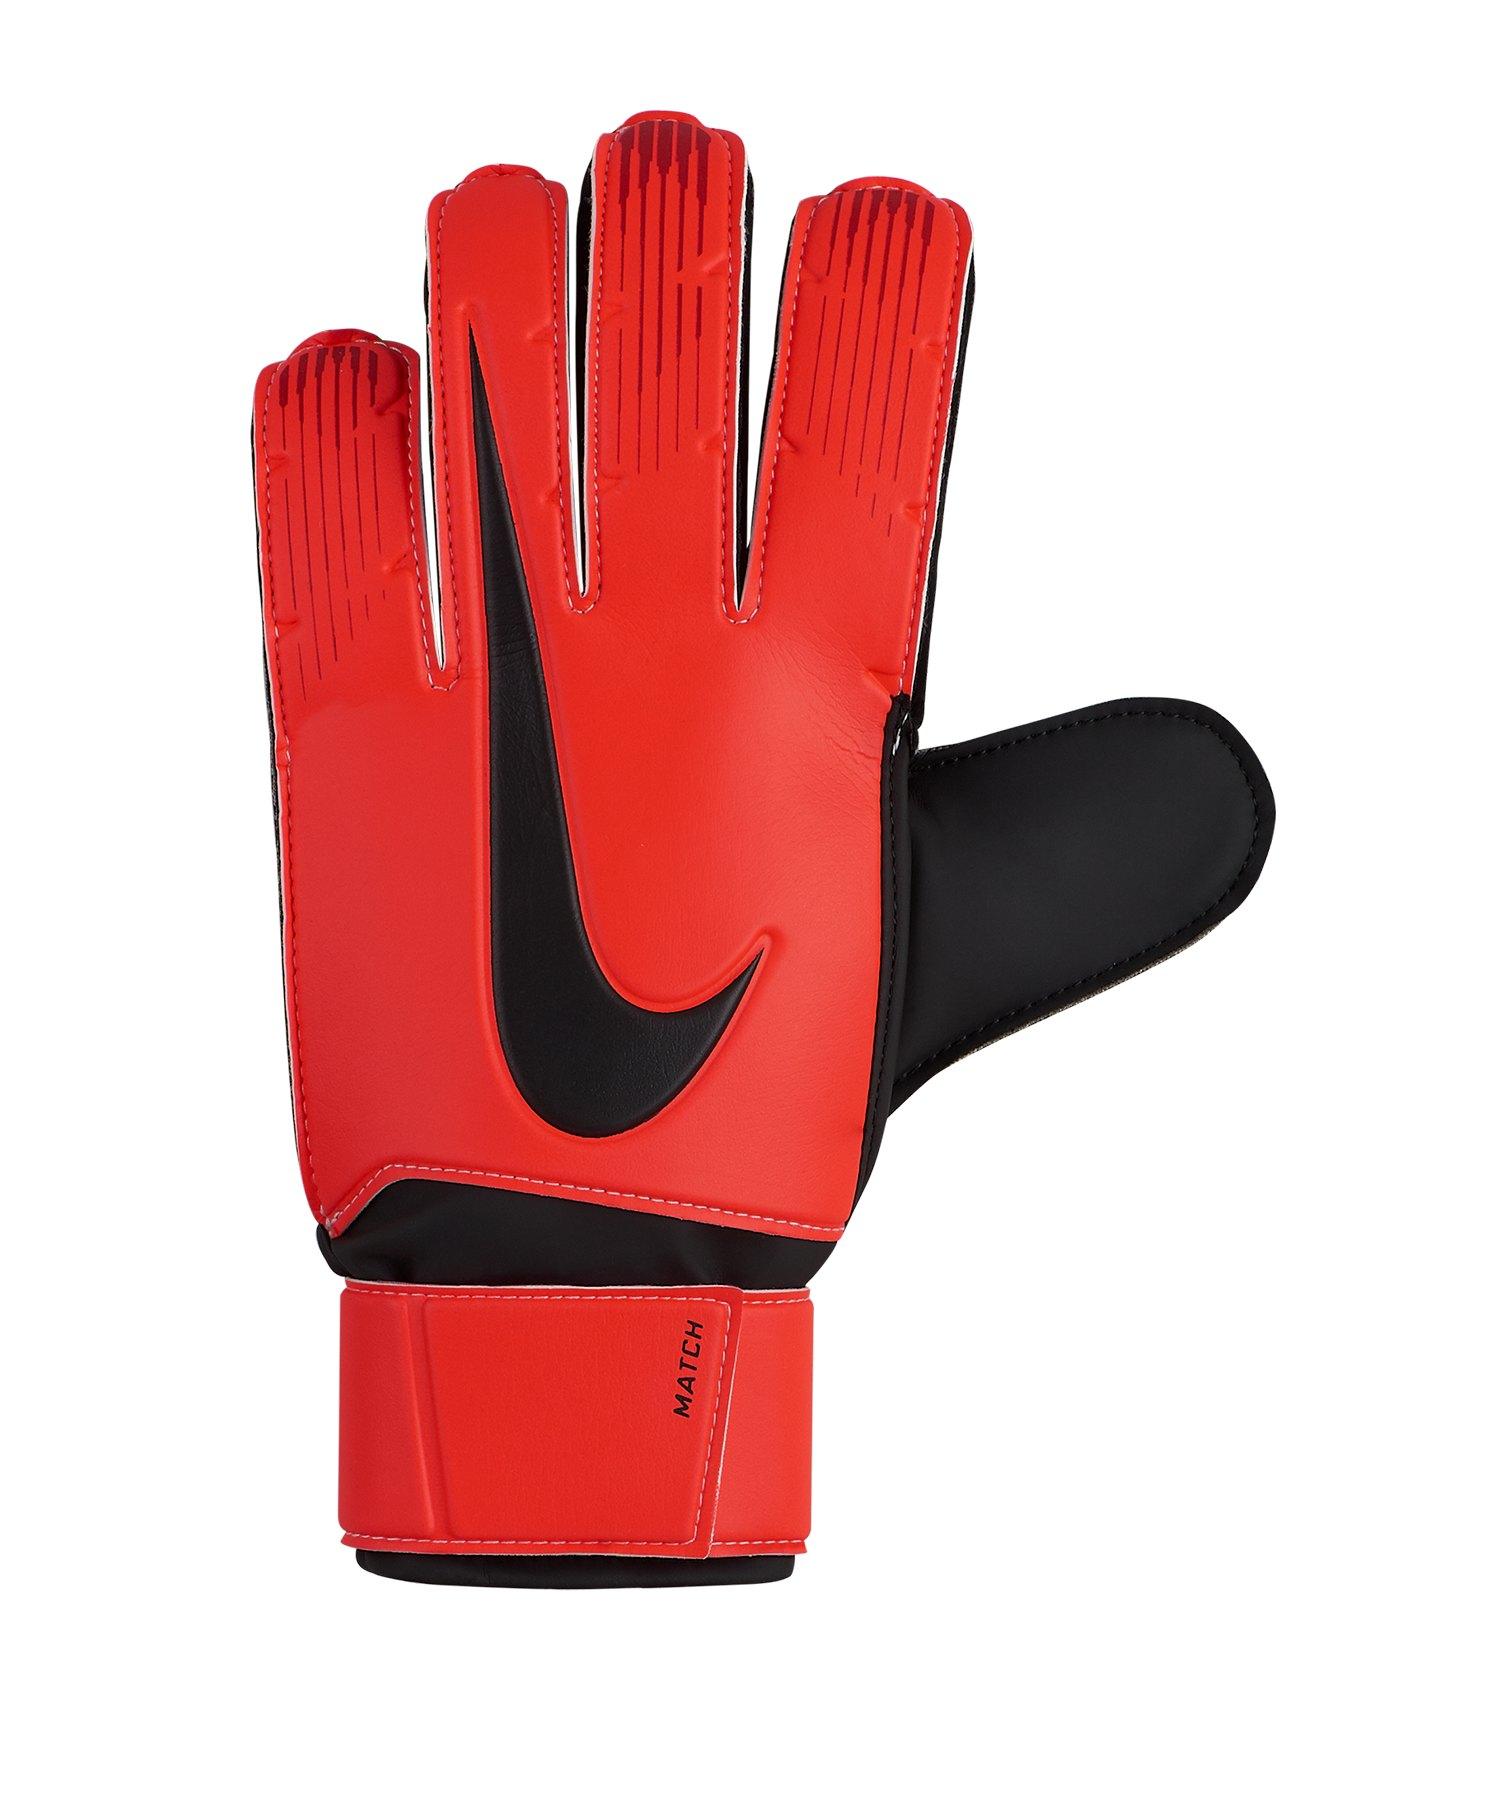 Nike Match Torwarthandschuh Rot Schwarz F657 - rot